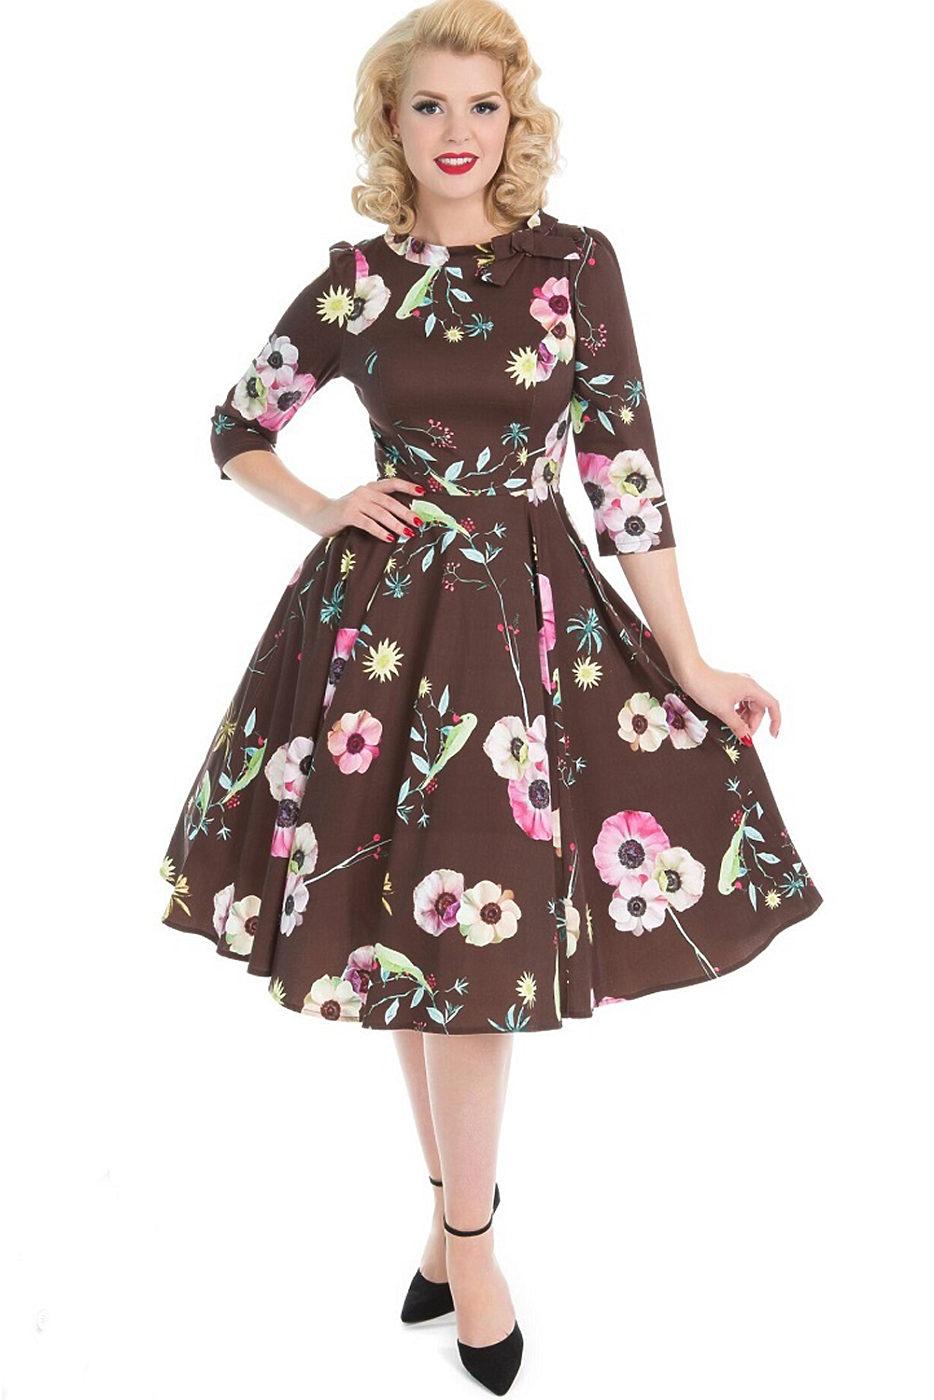 dfd04ff05f5b Hnědé šaty s máky Hearts Roses Poppy Hearts   Roses London